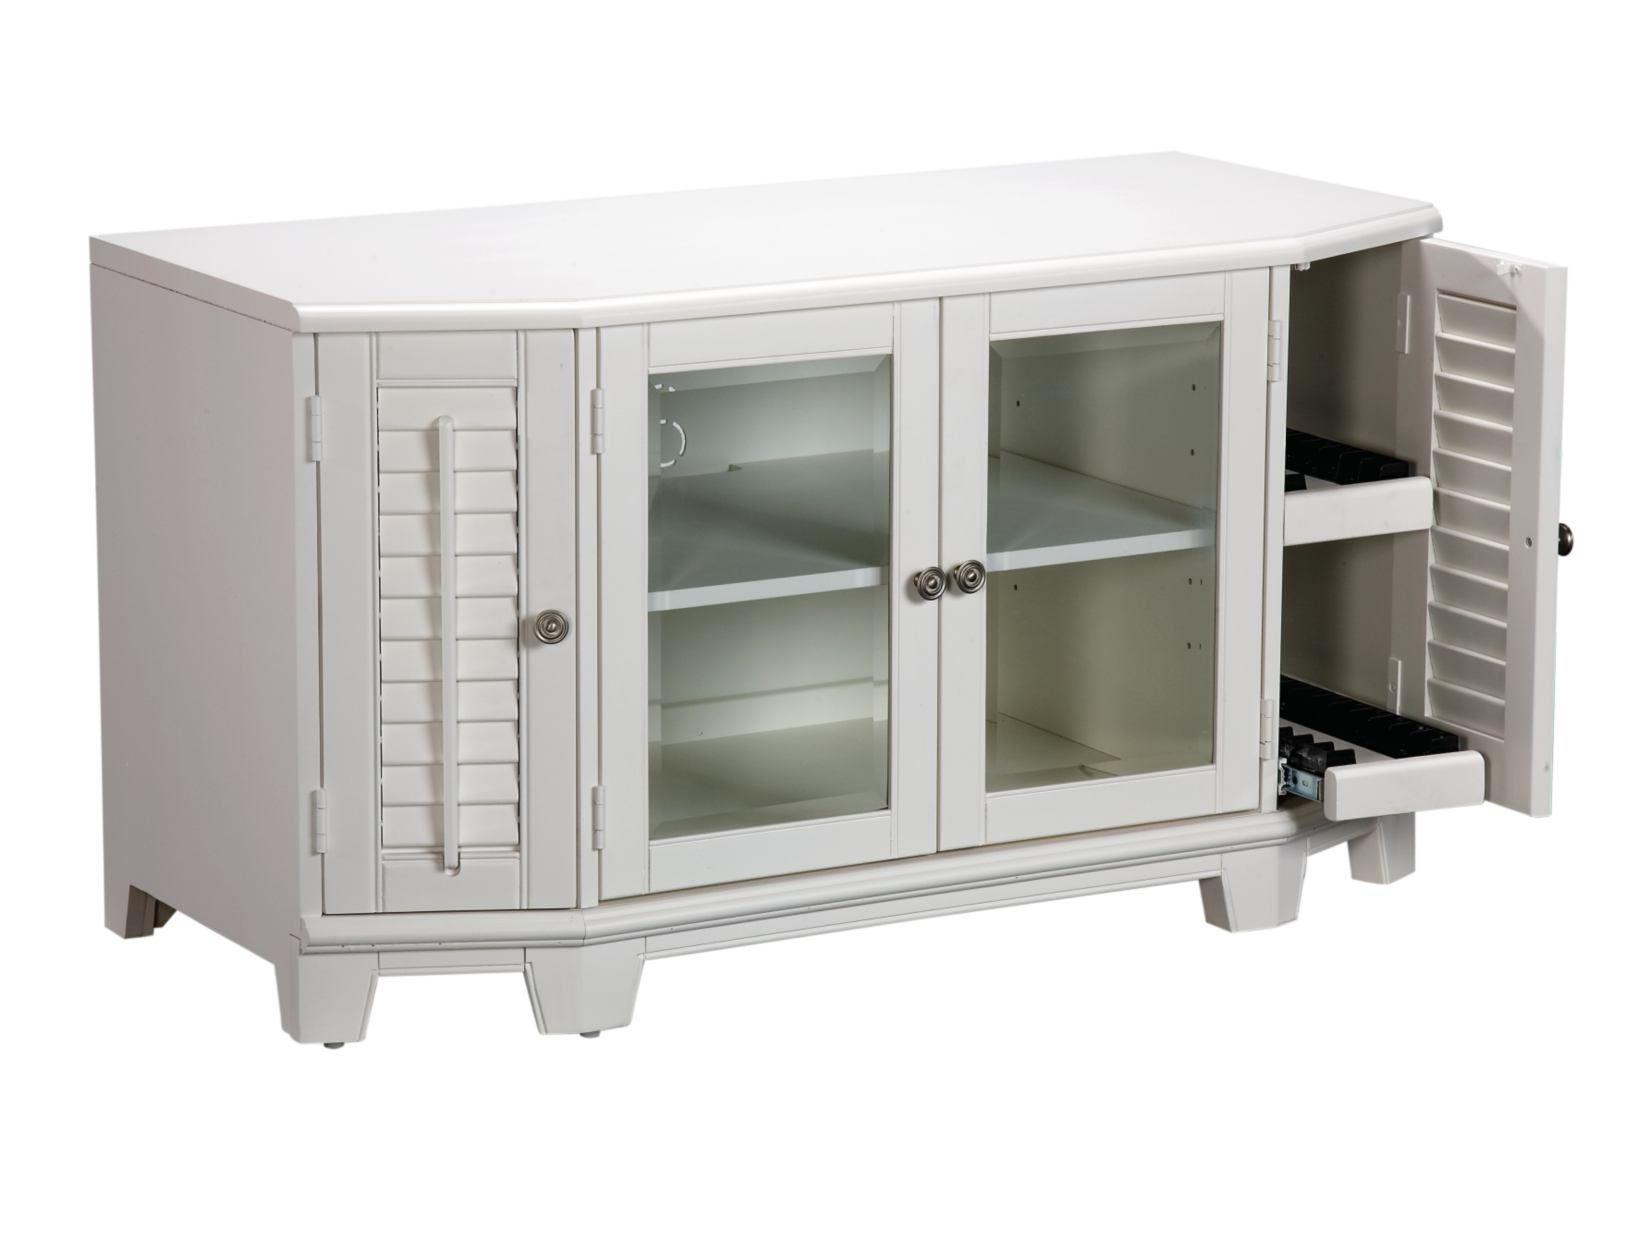 Plantation cove 48 white tv stand value city furniture - Plantation cove bedroom furniture ...